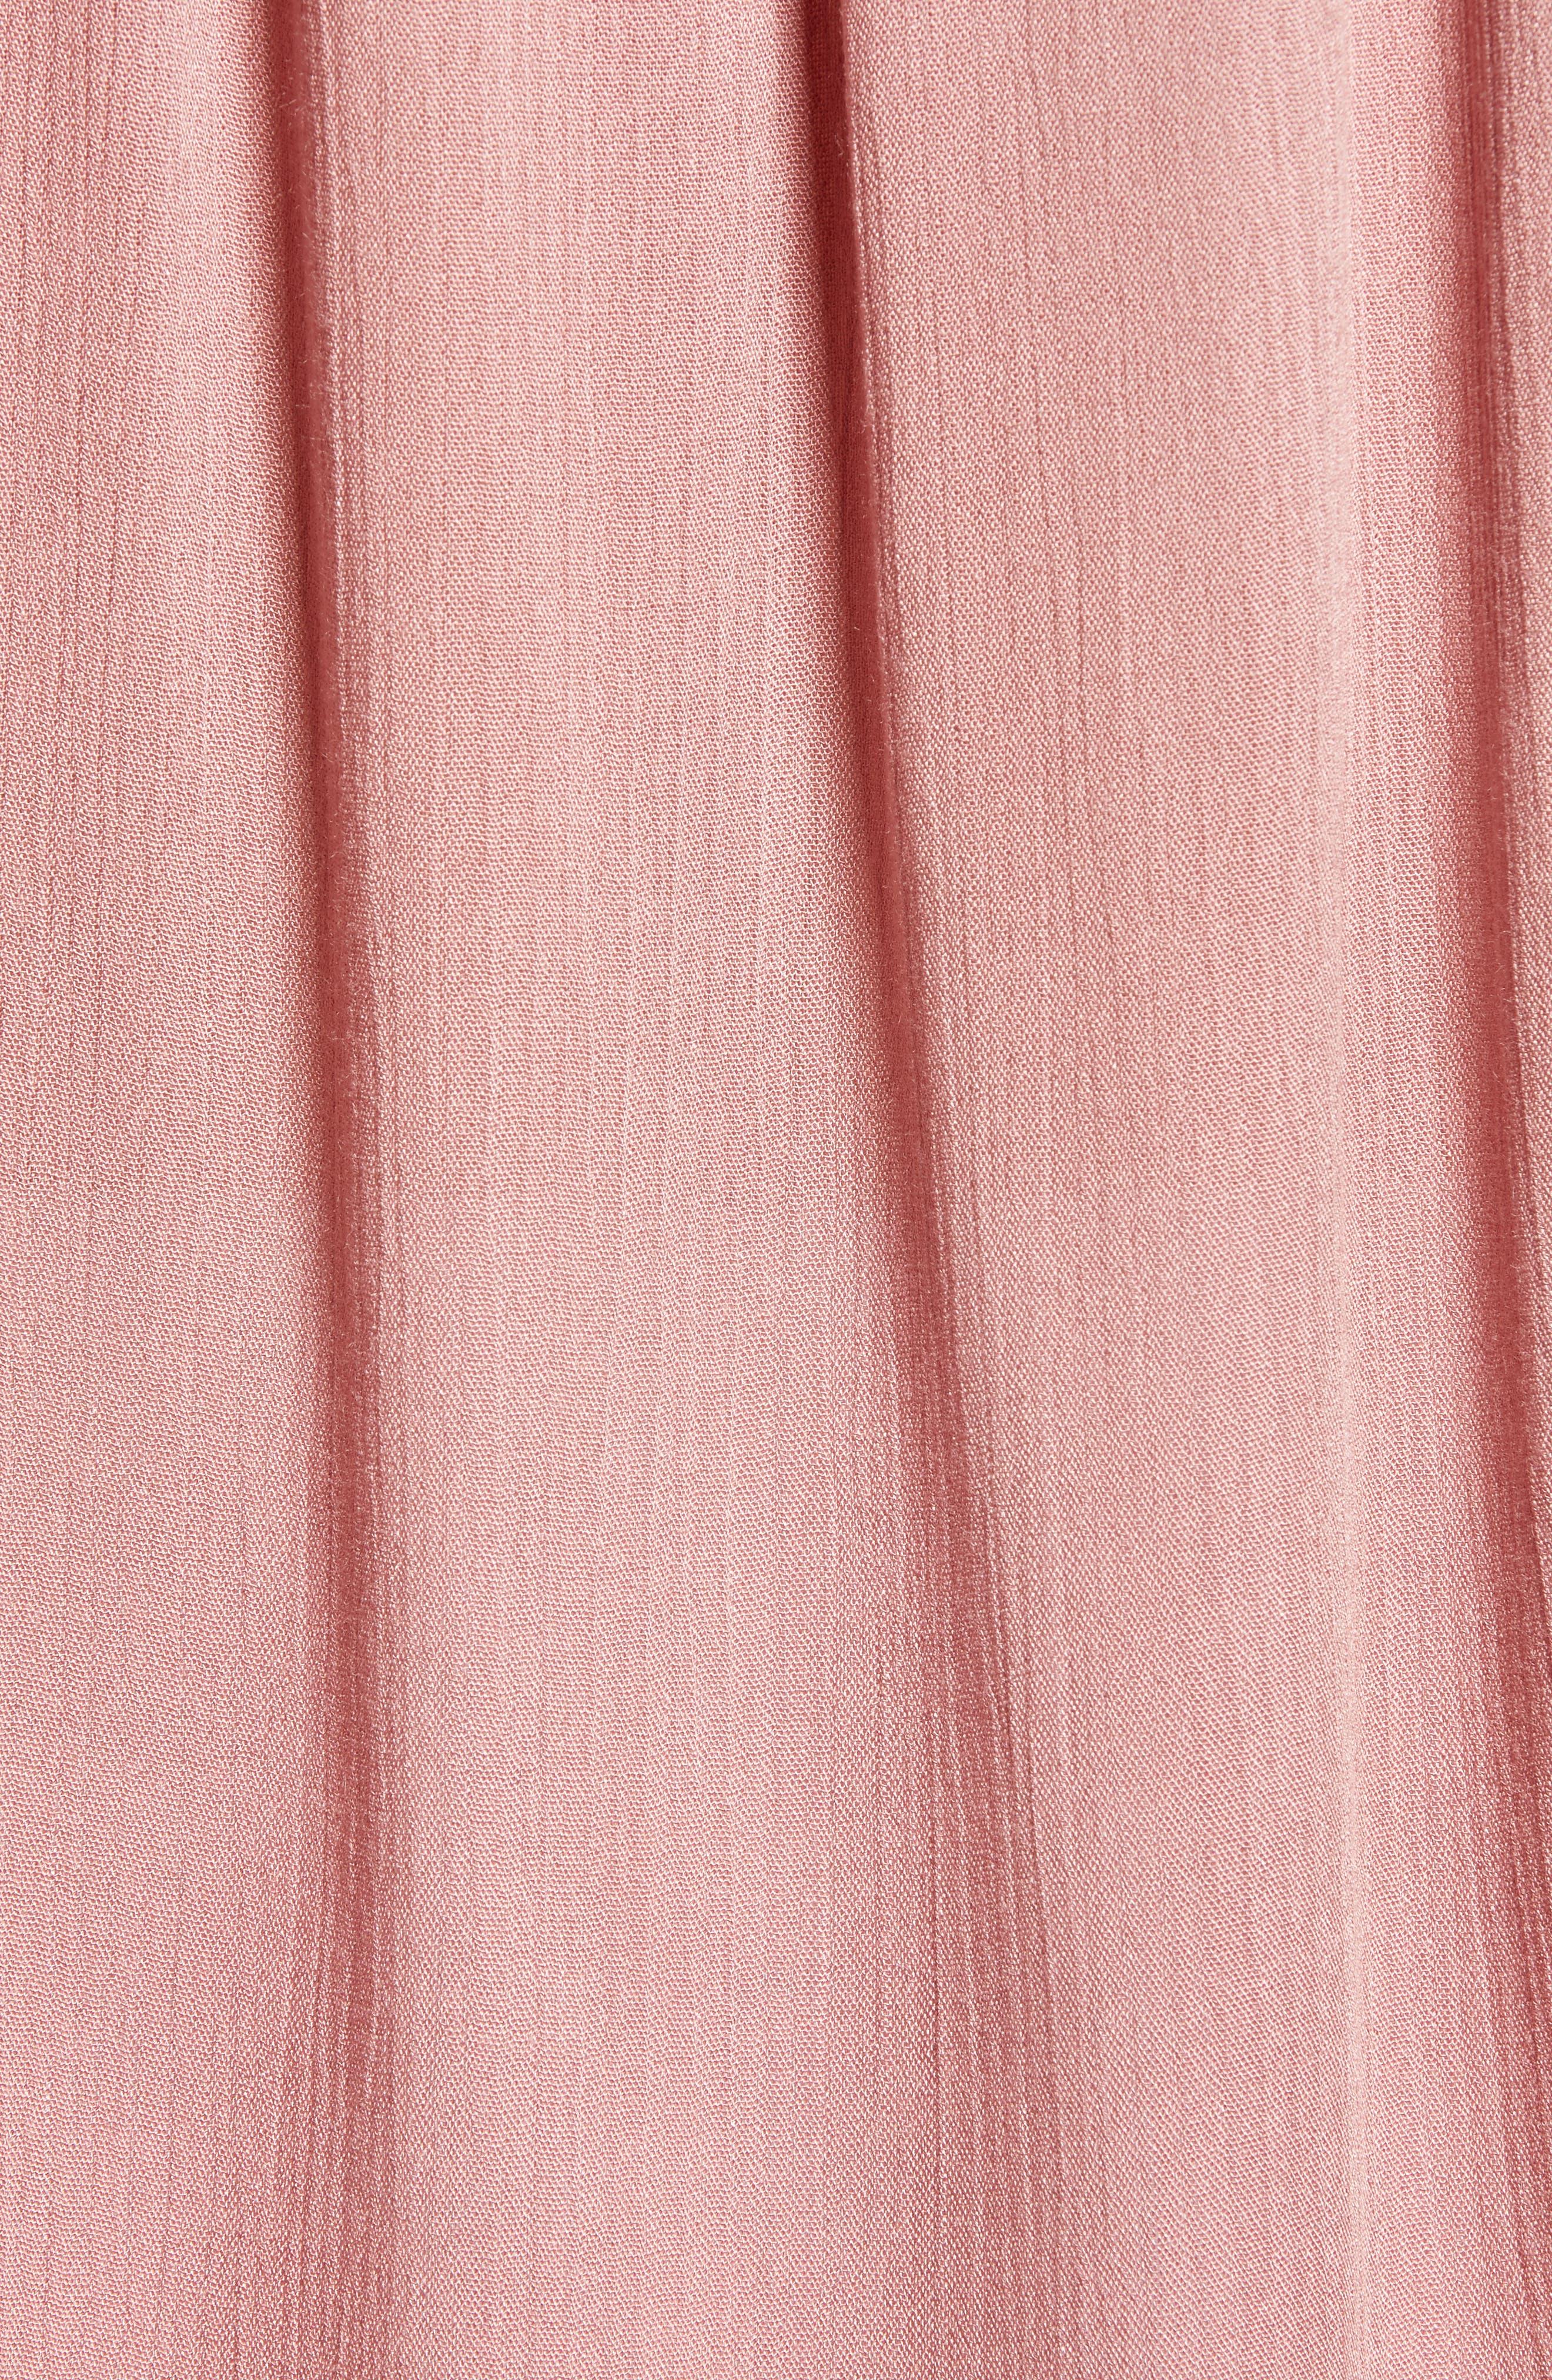 Relaxed Short Sleeve Crinkle Blouse,                             Alternate thumbnail 6, color,                             Mauve/ Terracotta